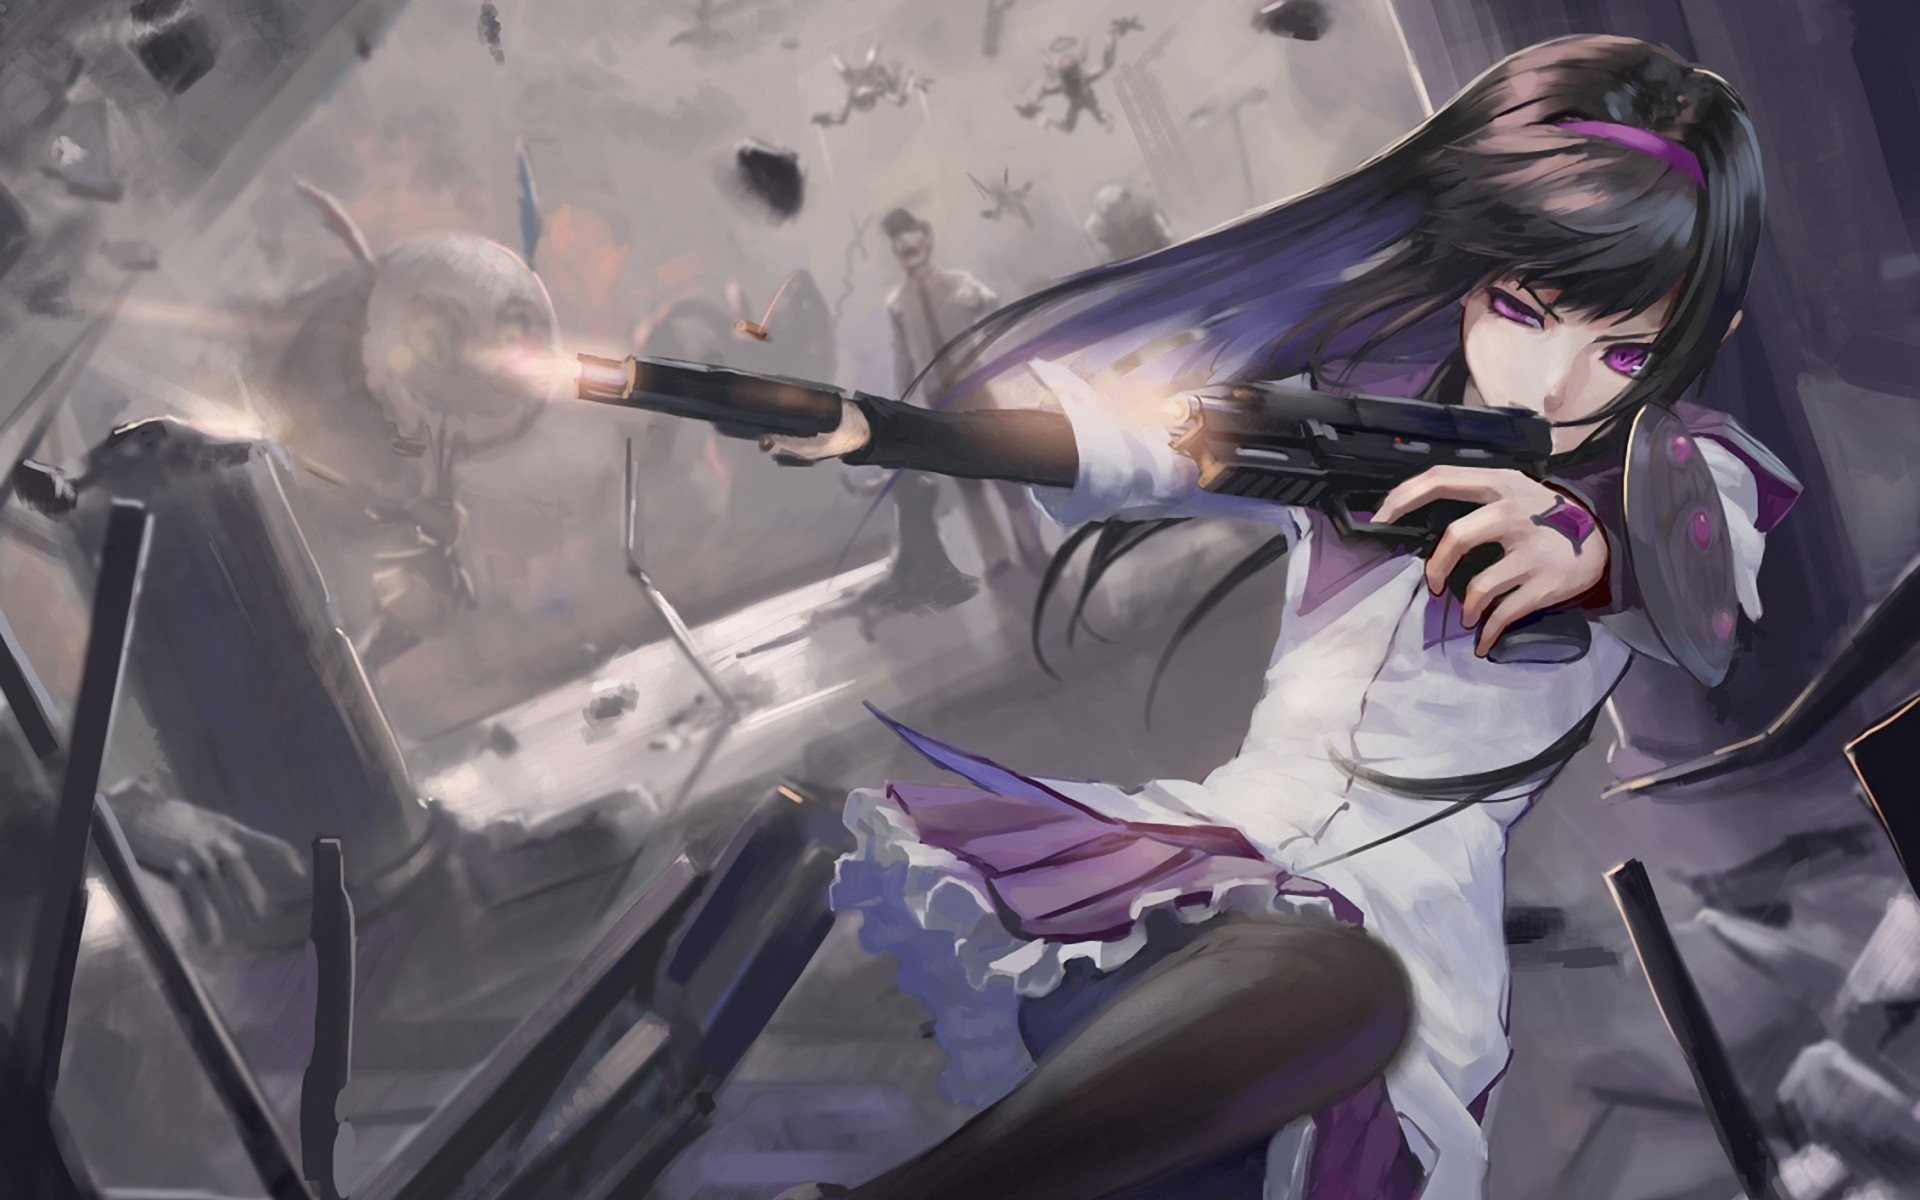 Anime Guns Girls Mahou Shoujo Madoka Magica Akemi Homura With